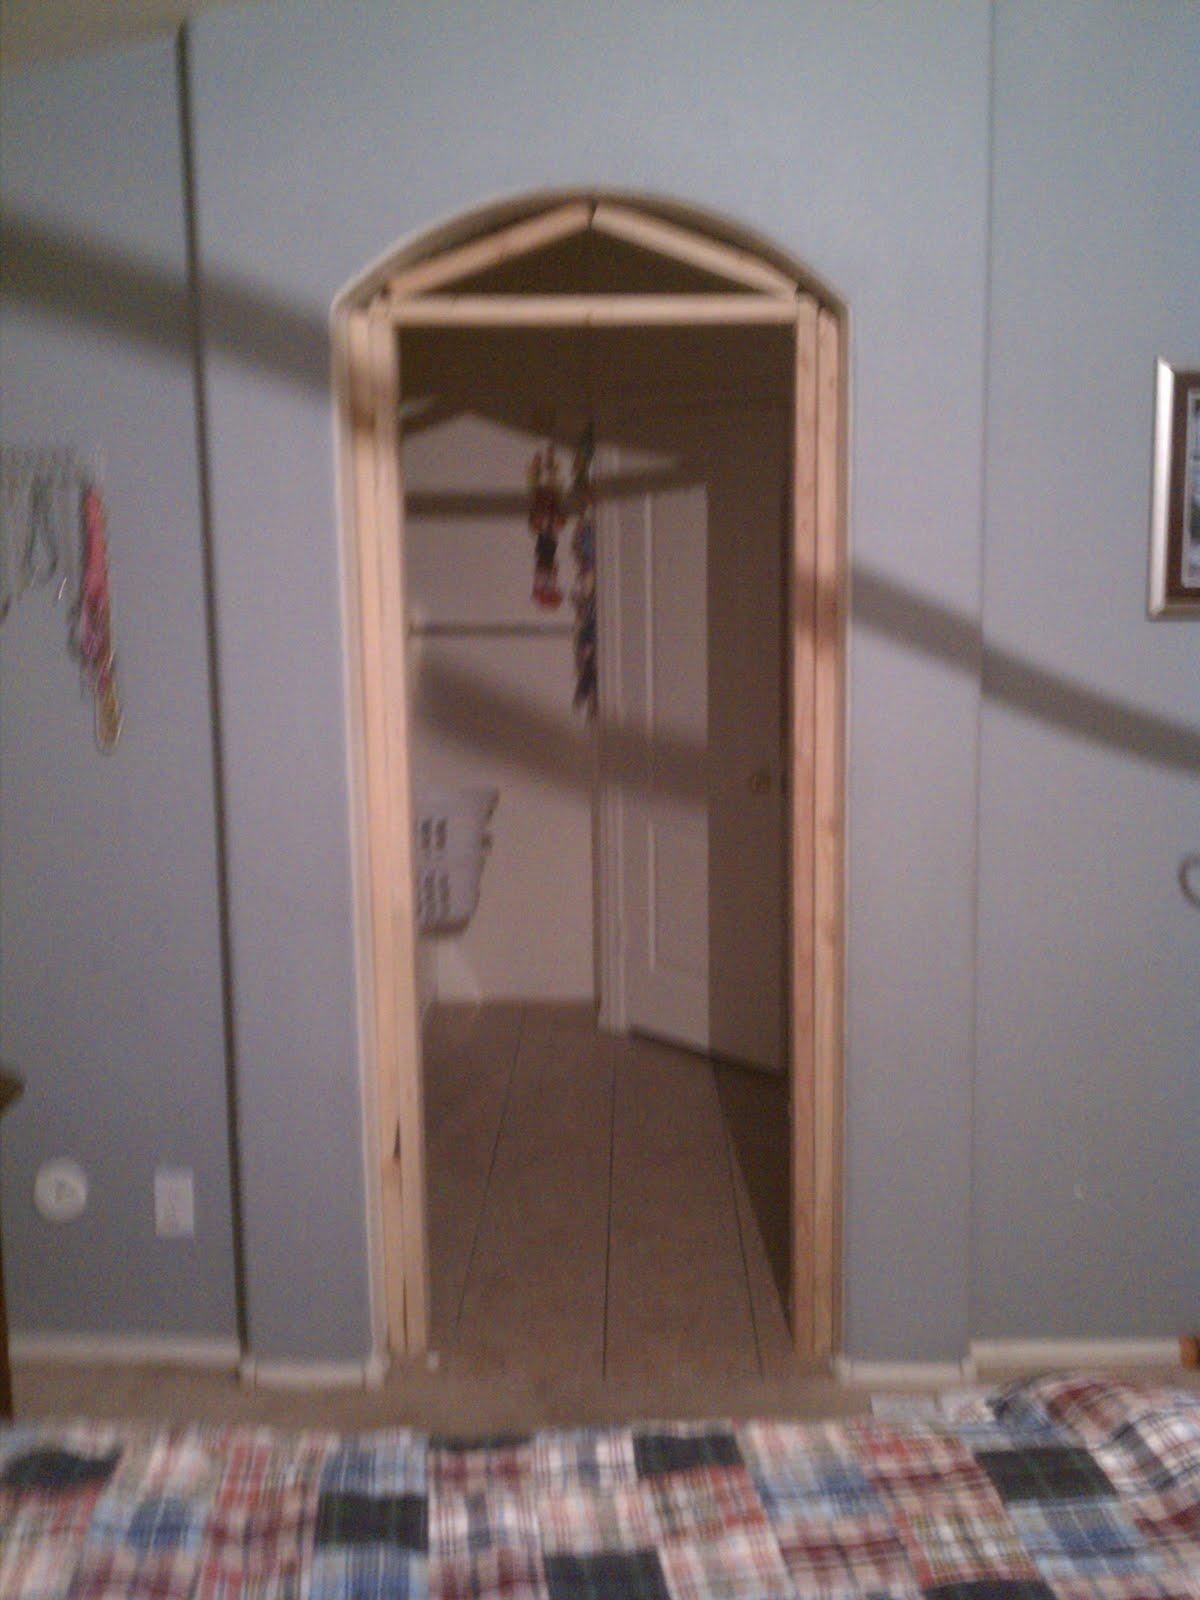 Framing A Bathroom Archway to Add A Door & The Orange Jeep Dad...blog.: Framing A Bathroom Archway to Add A Door